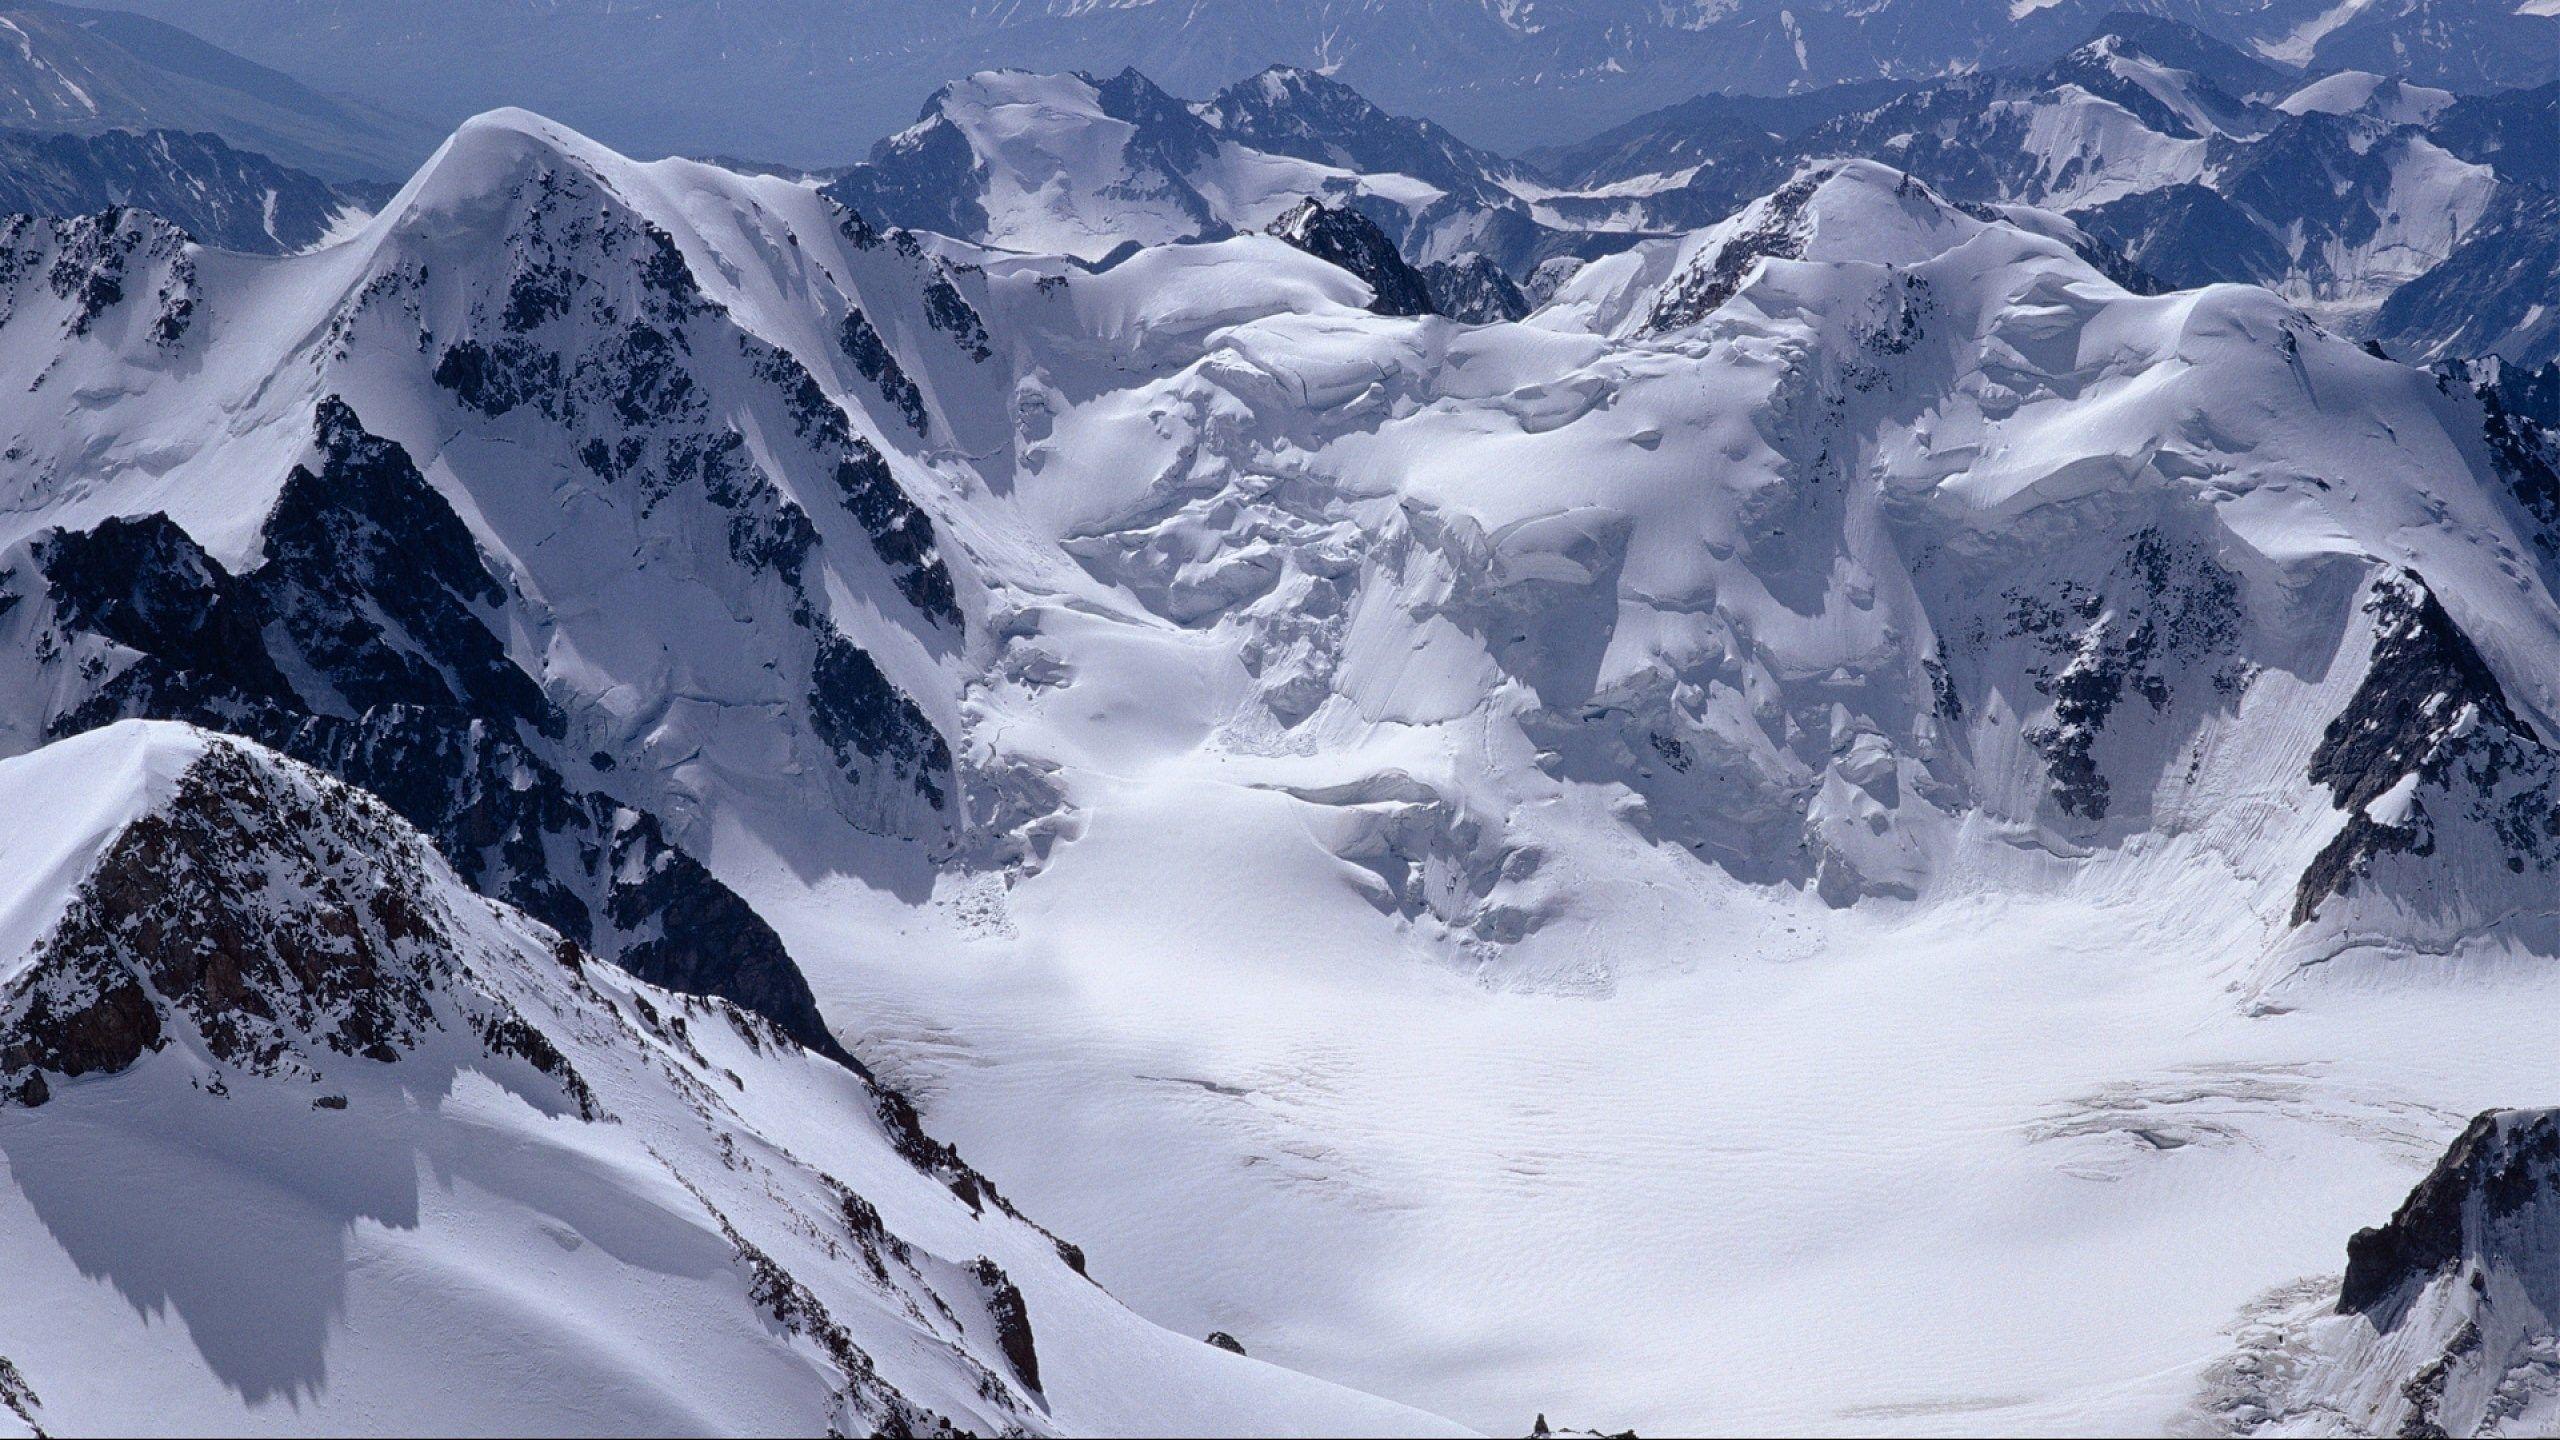 Mountain 1080p High Quality 2560x1440 Mountain Wallpaper Winter Wallpaper Desktop Snow Images